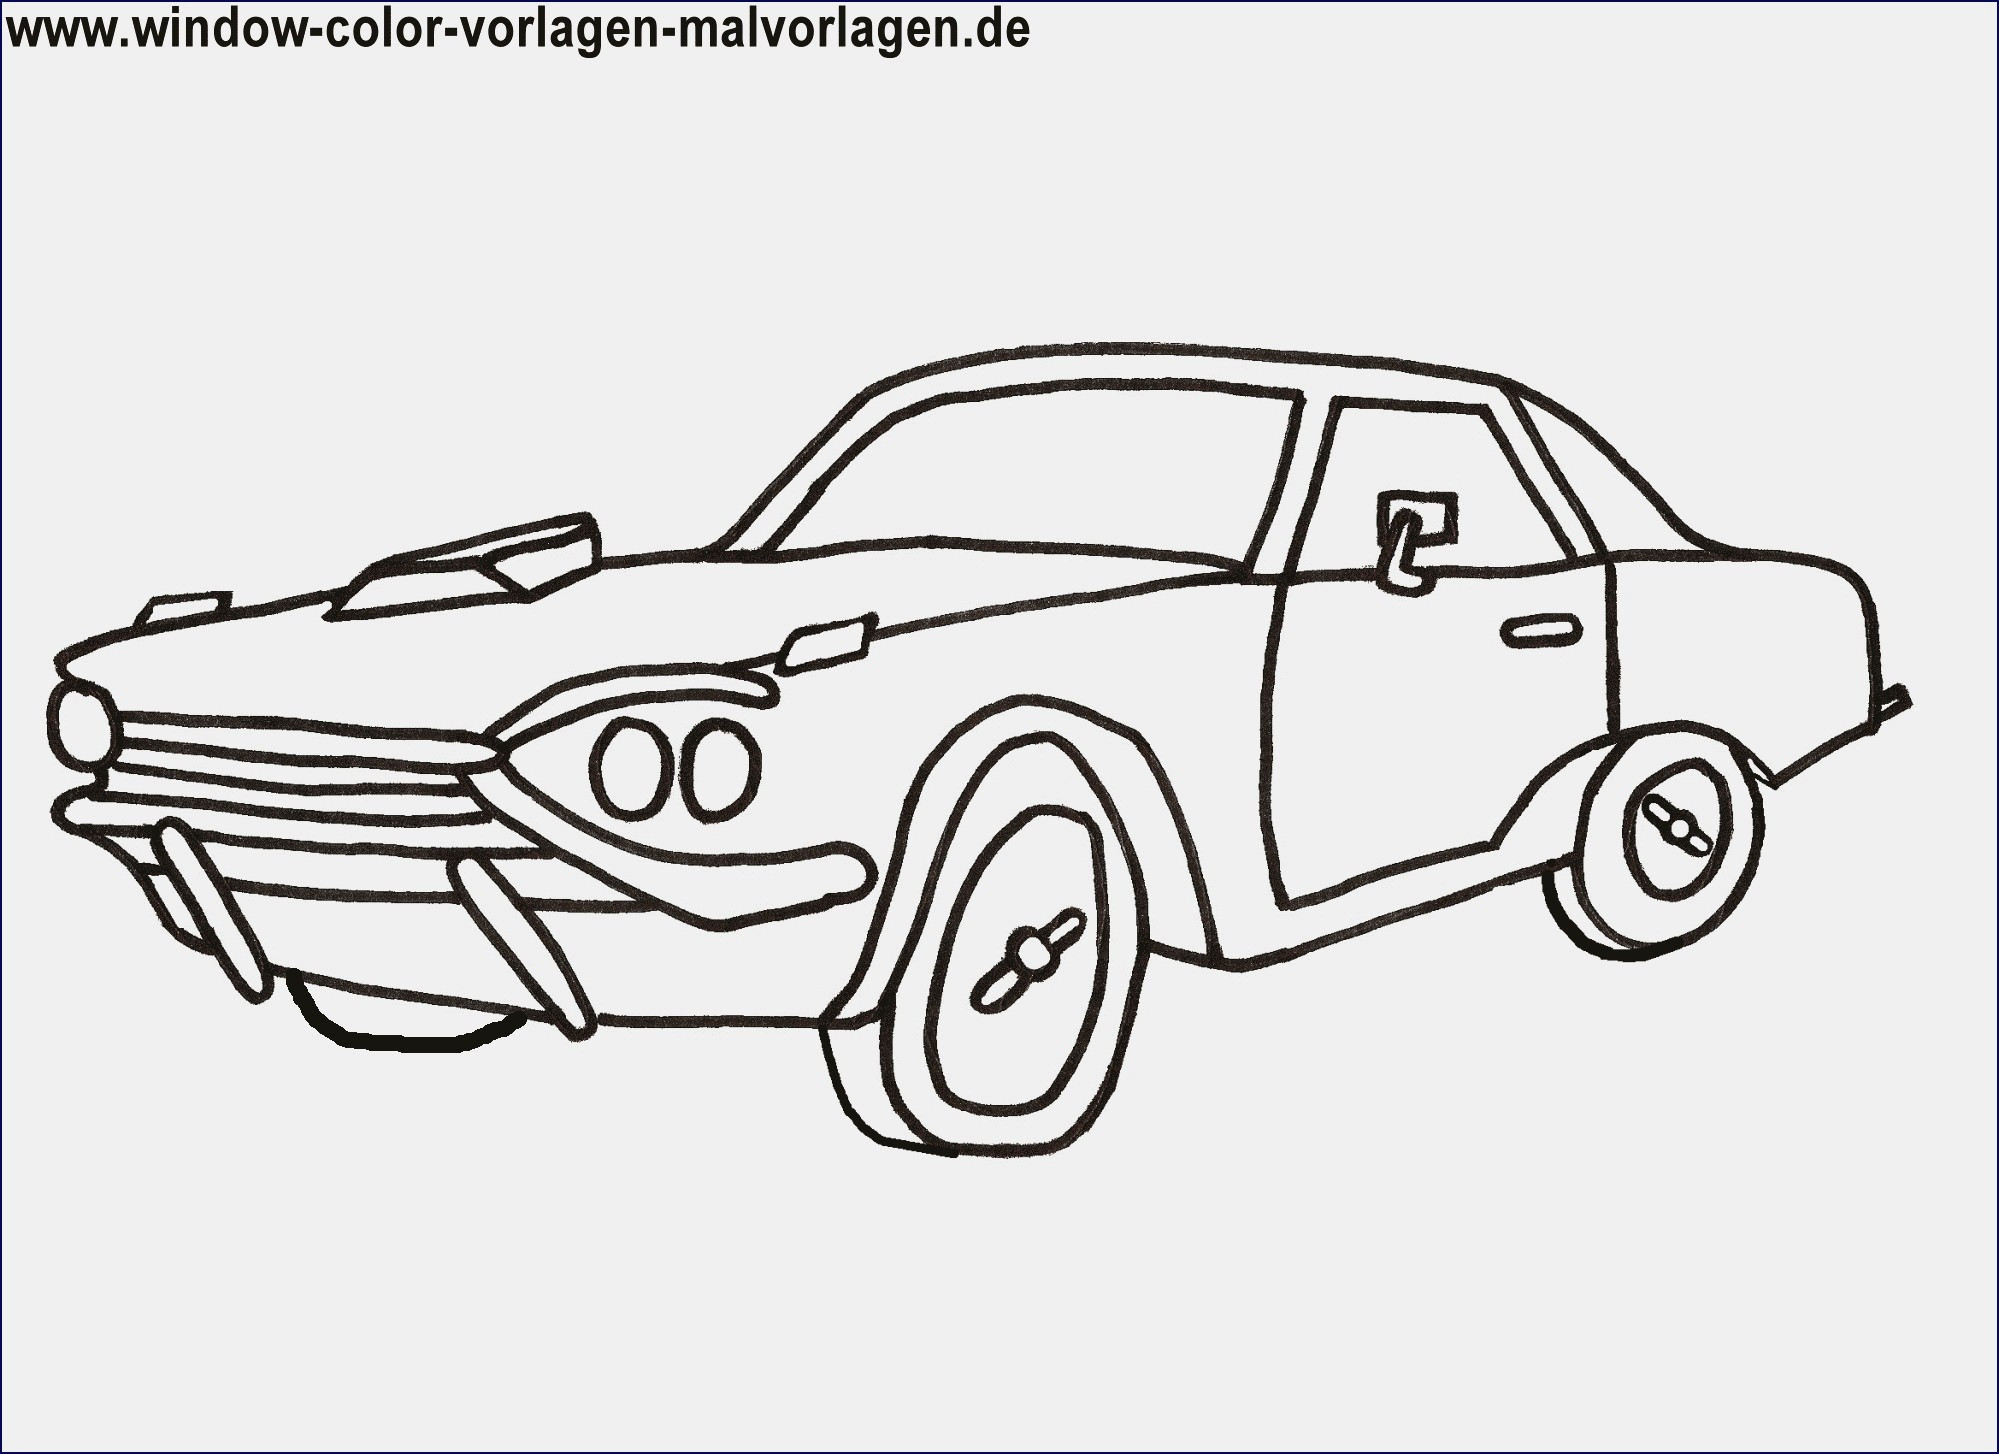 Ausmalbilder Autos Lamborghini Genial Ausmalbild Auto Verschiedene Bilder Färben 8 Inspirational Lego Das Bild